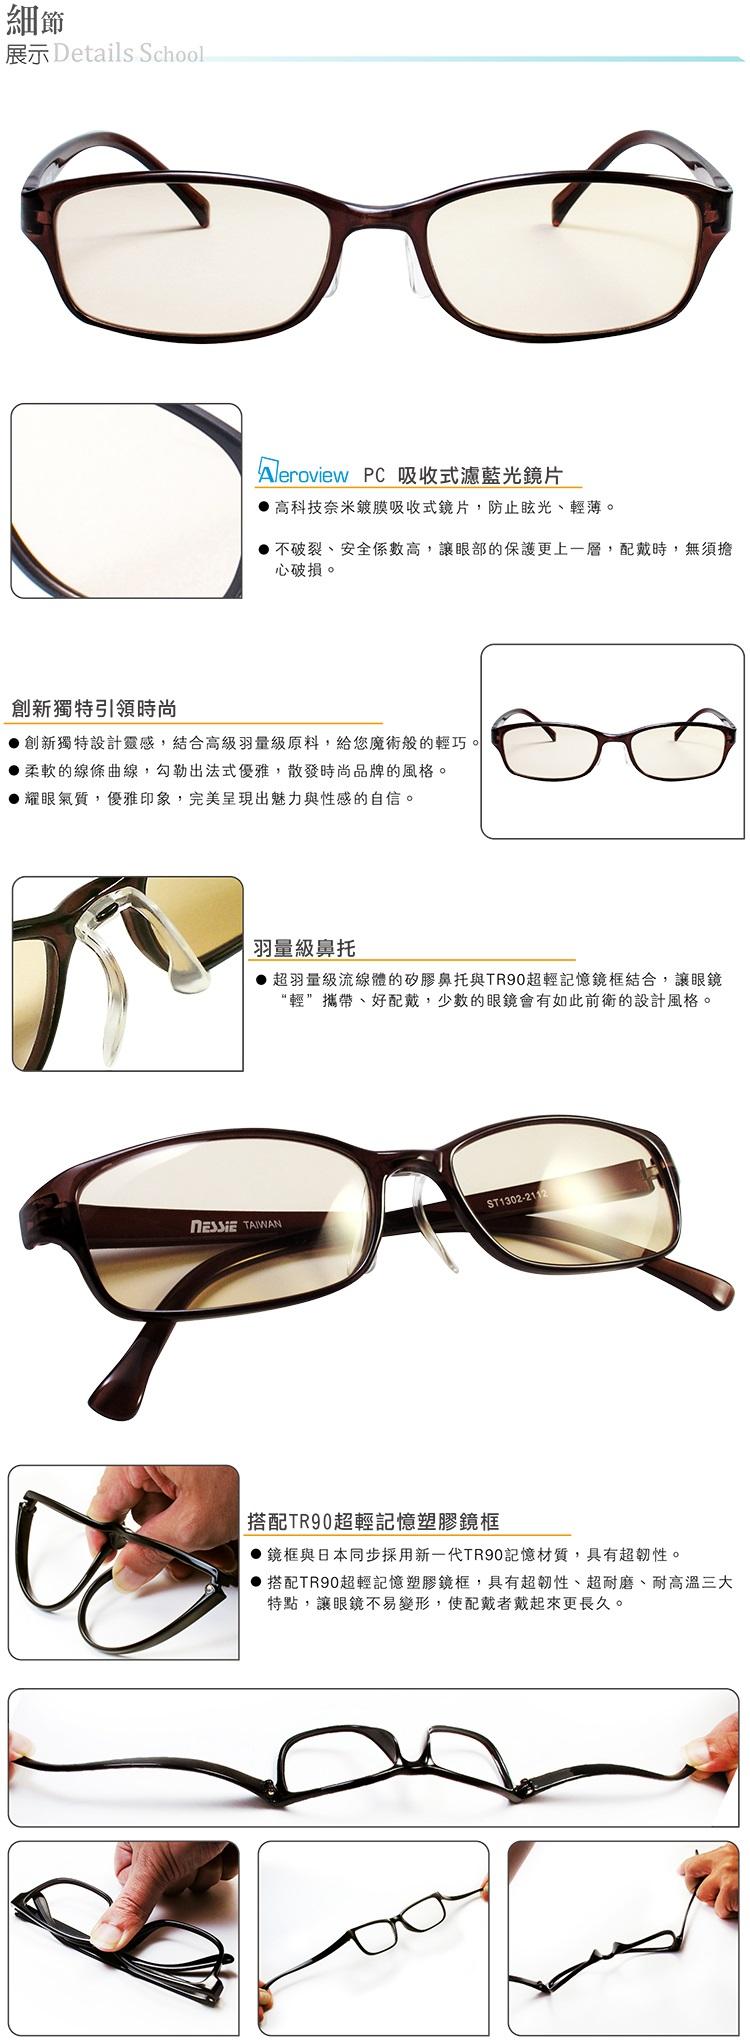 Nessie尼斯抗藍光眼鏡-琥珀棕